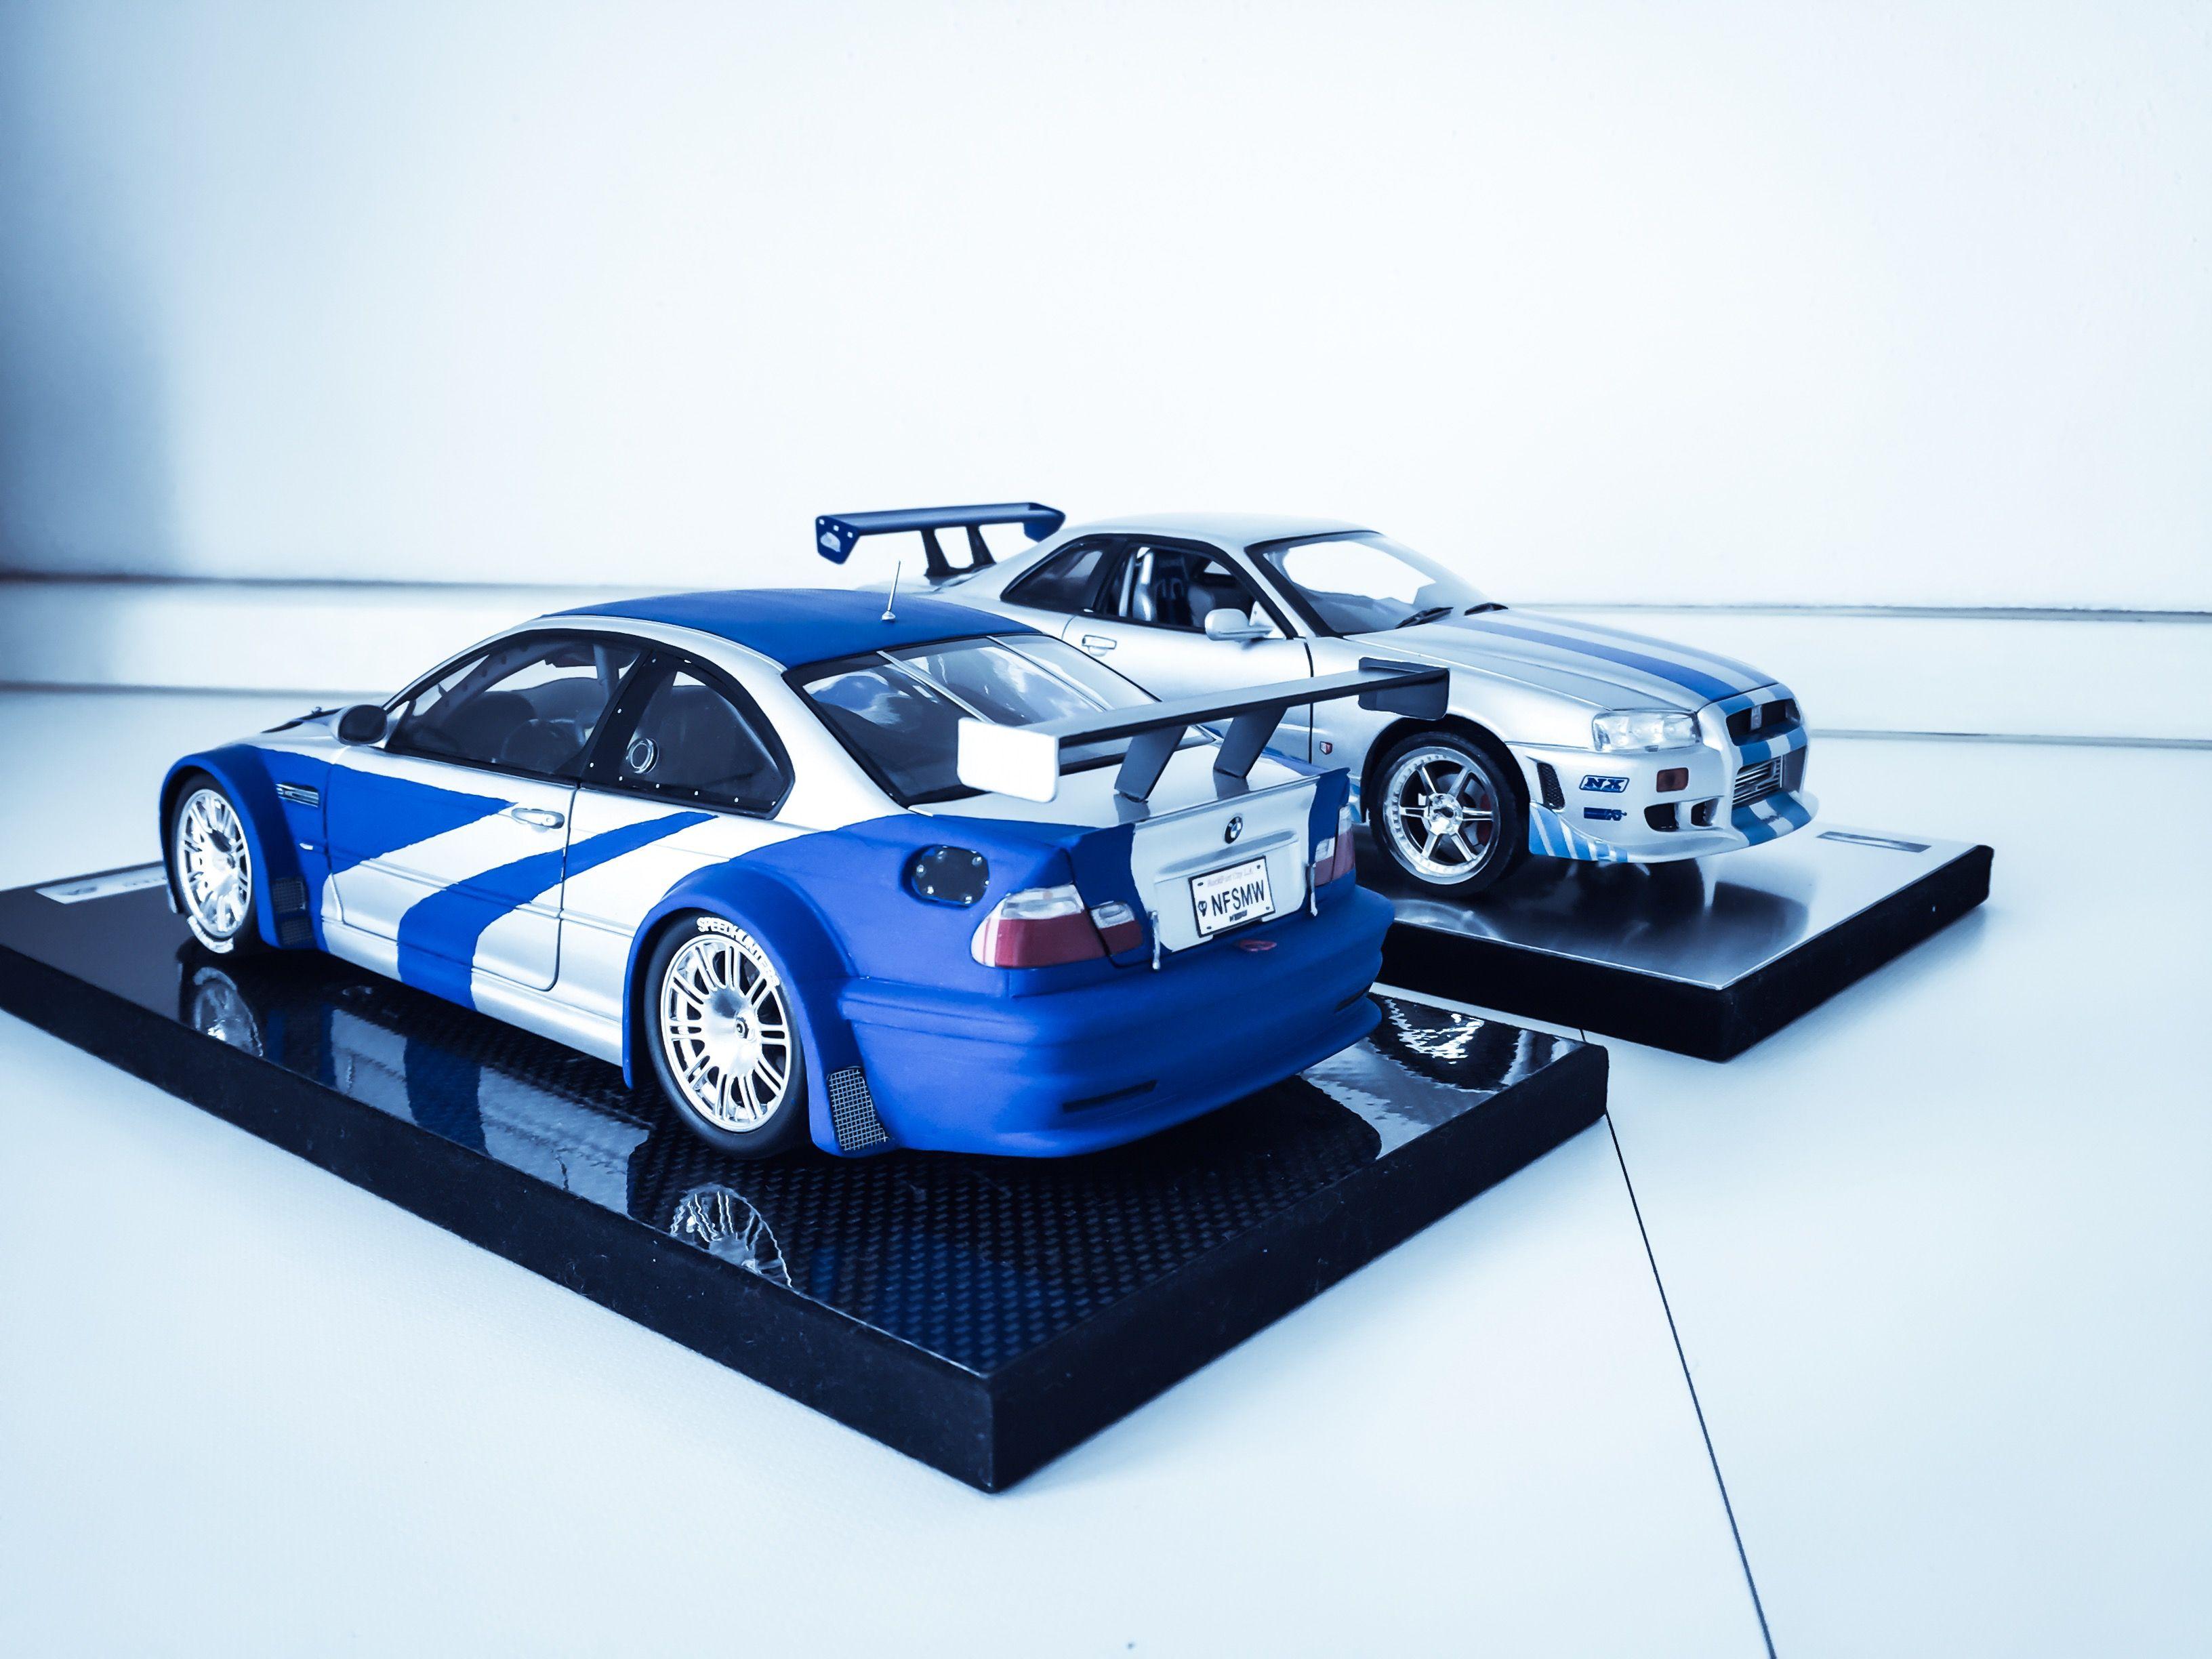 BMW M GTR Nfsmw Nissan Skyline GTR Ff Hearts Pinterest - 2005 bmw m3 gtr for sale